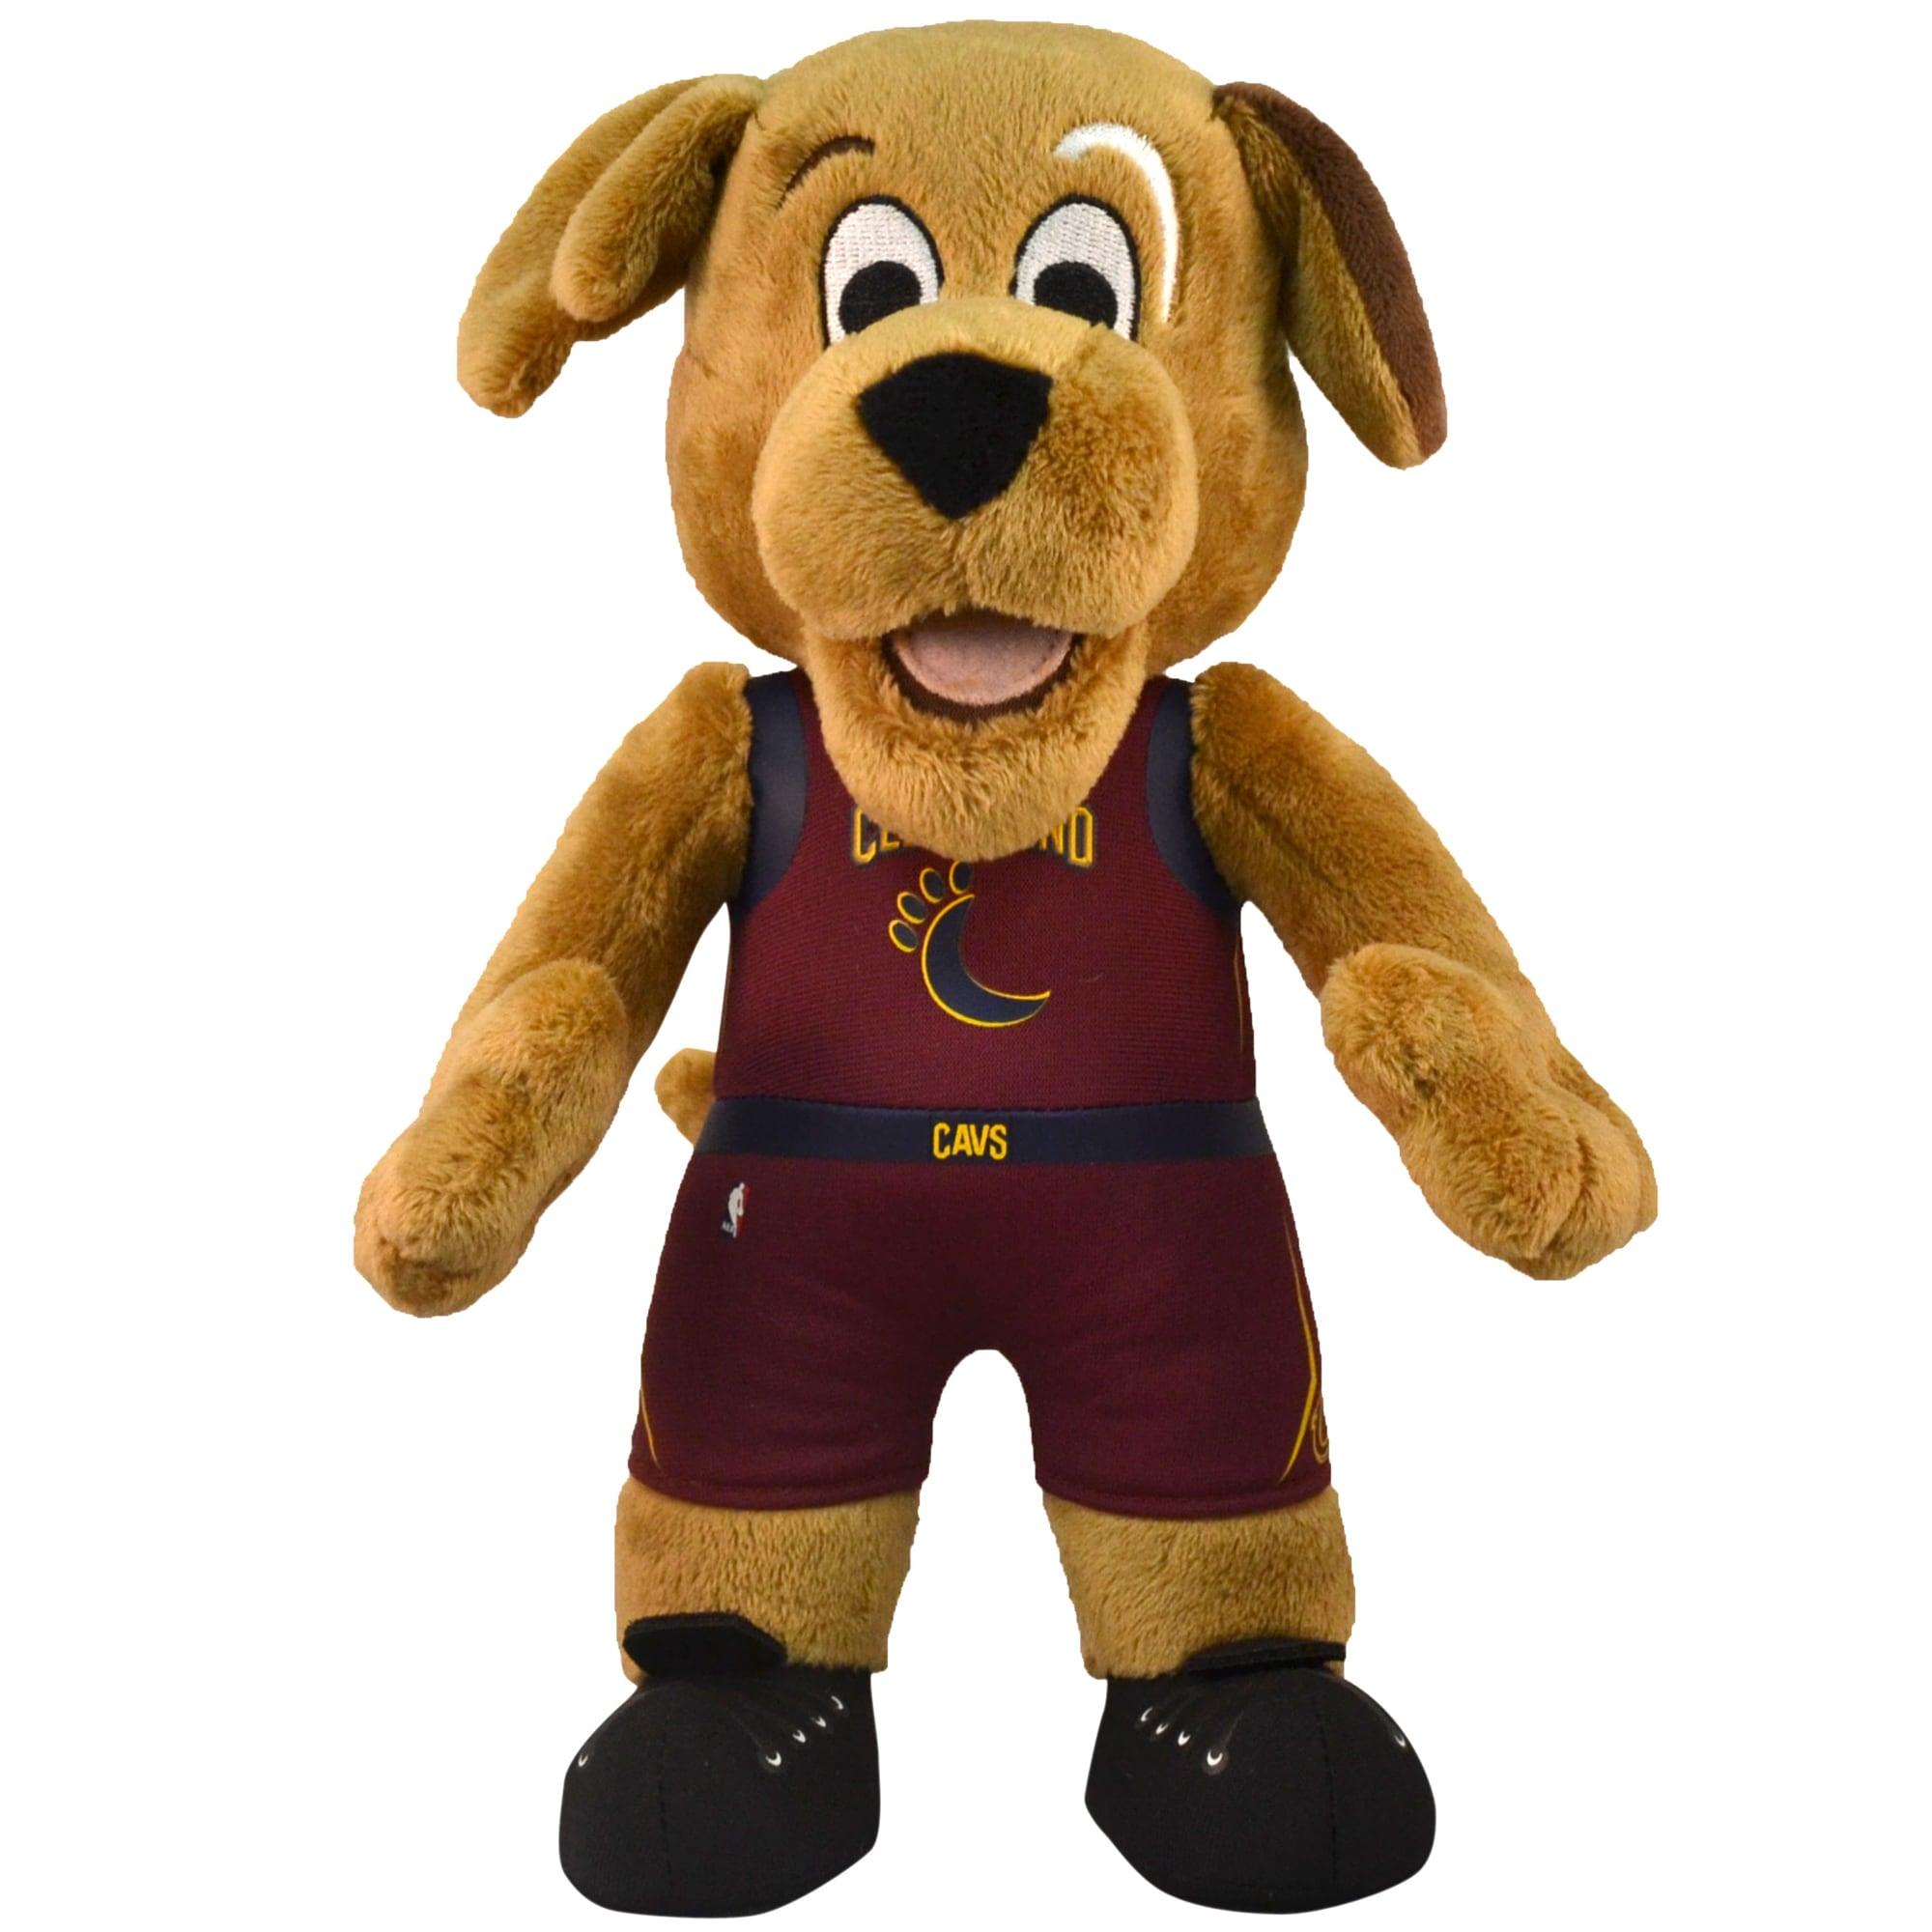 Cleveland Cavaliers 10'' Plush Mascot Figure